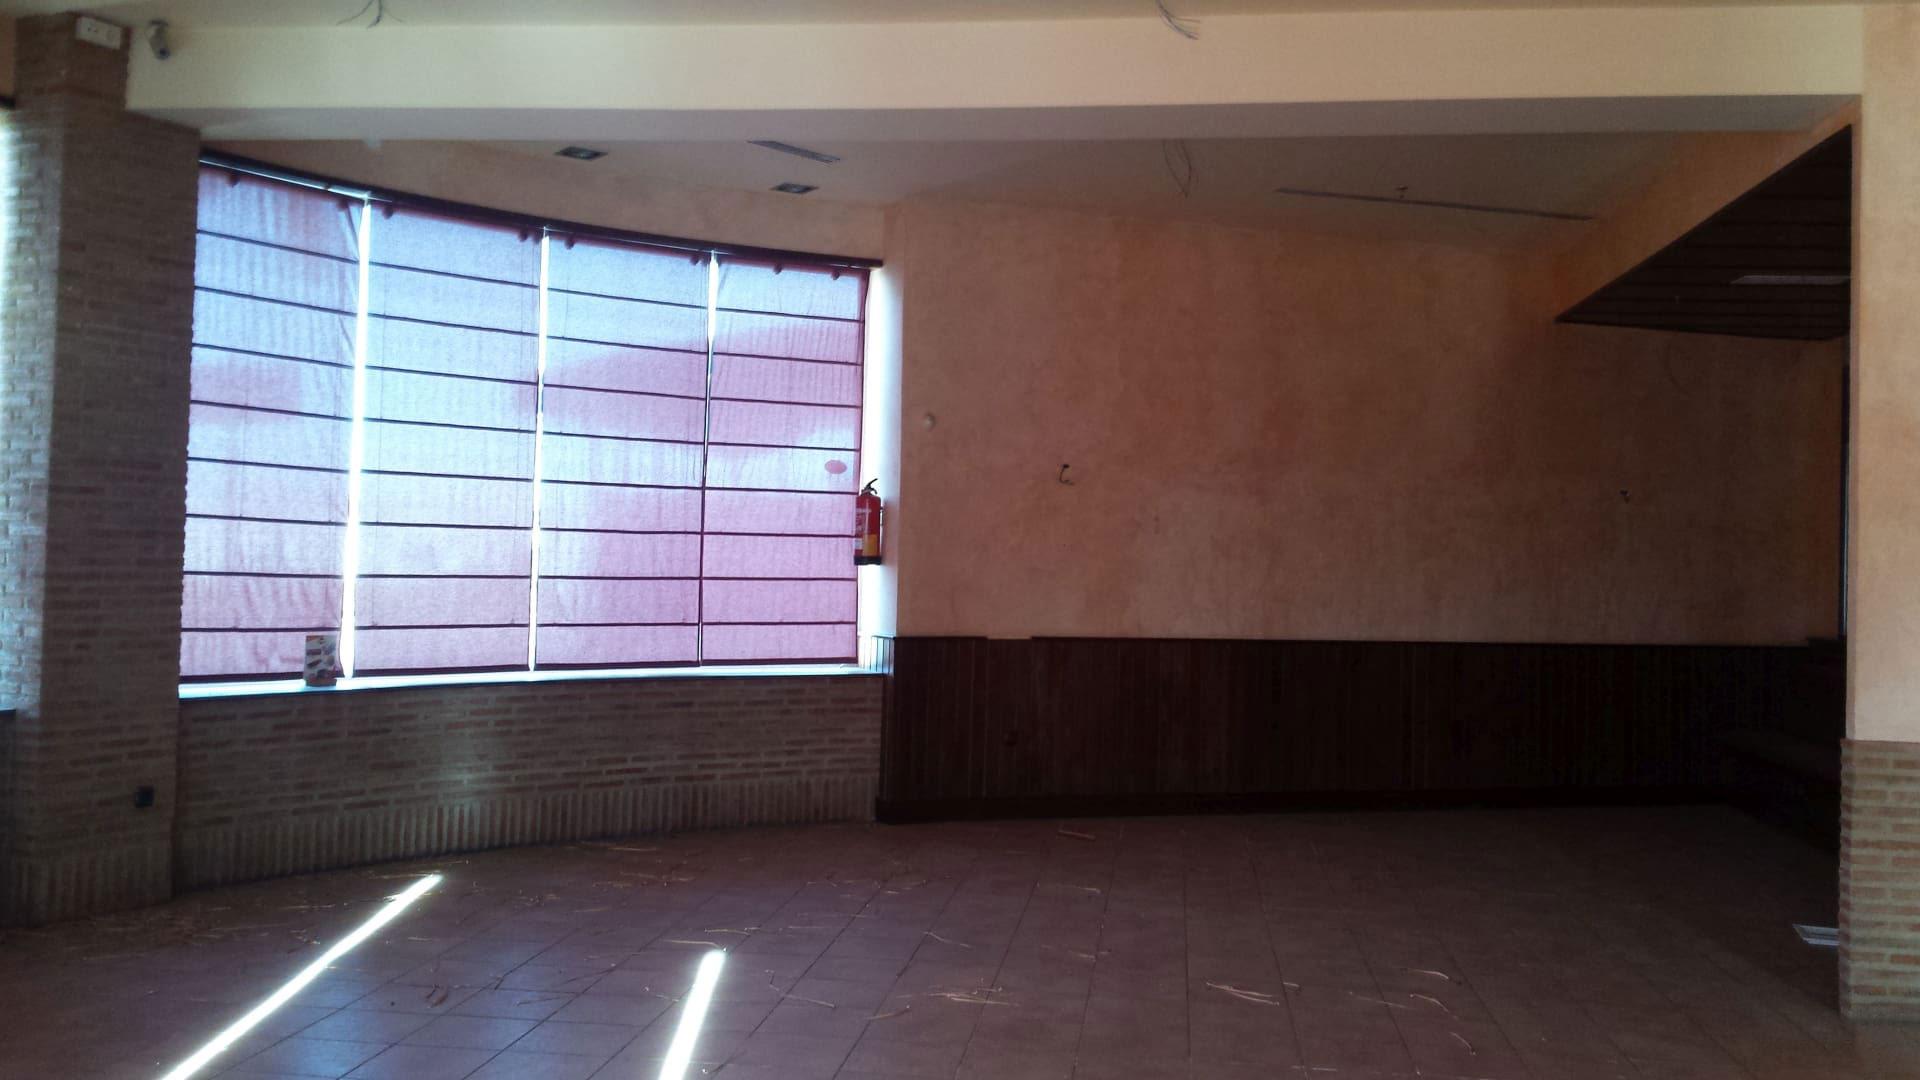 Local en venta en Local en Don Benito, Badajoz, 176.299 €, 312 m2